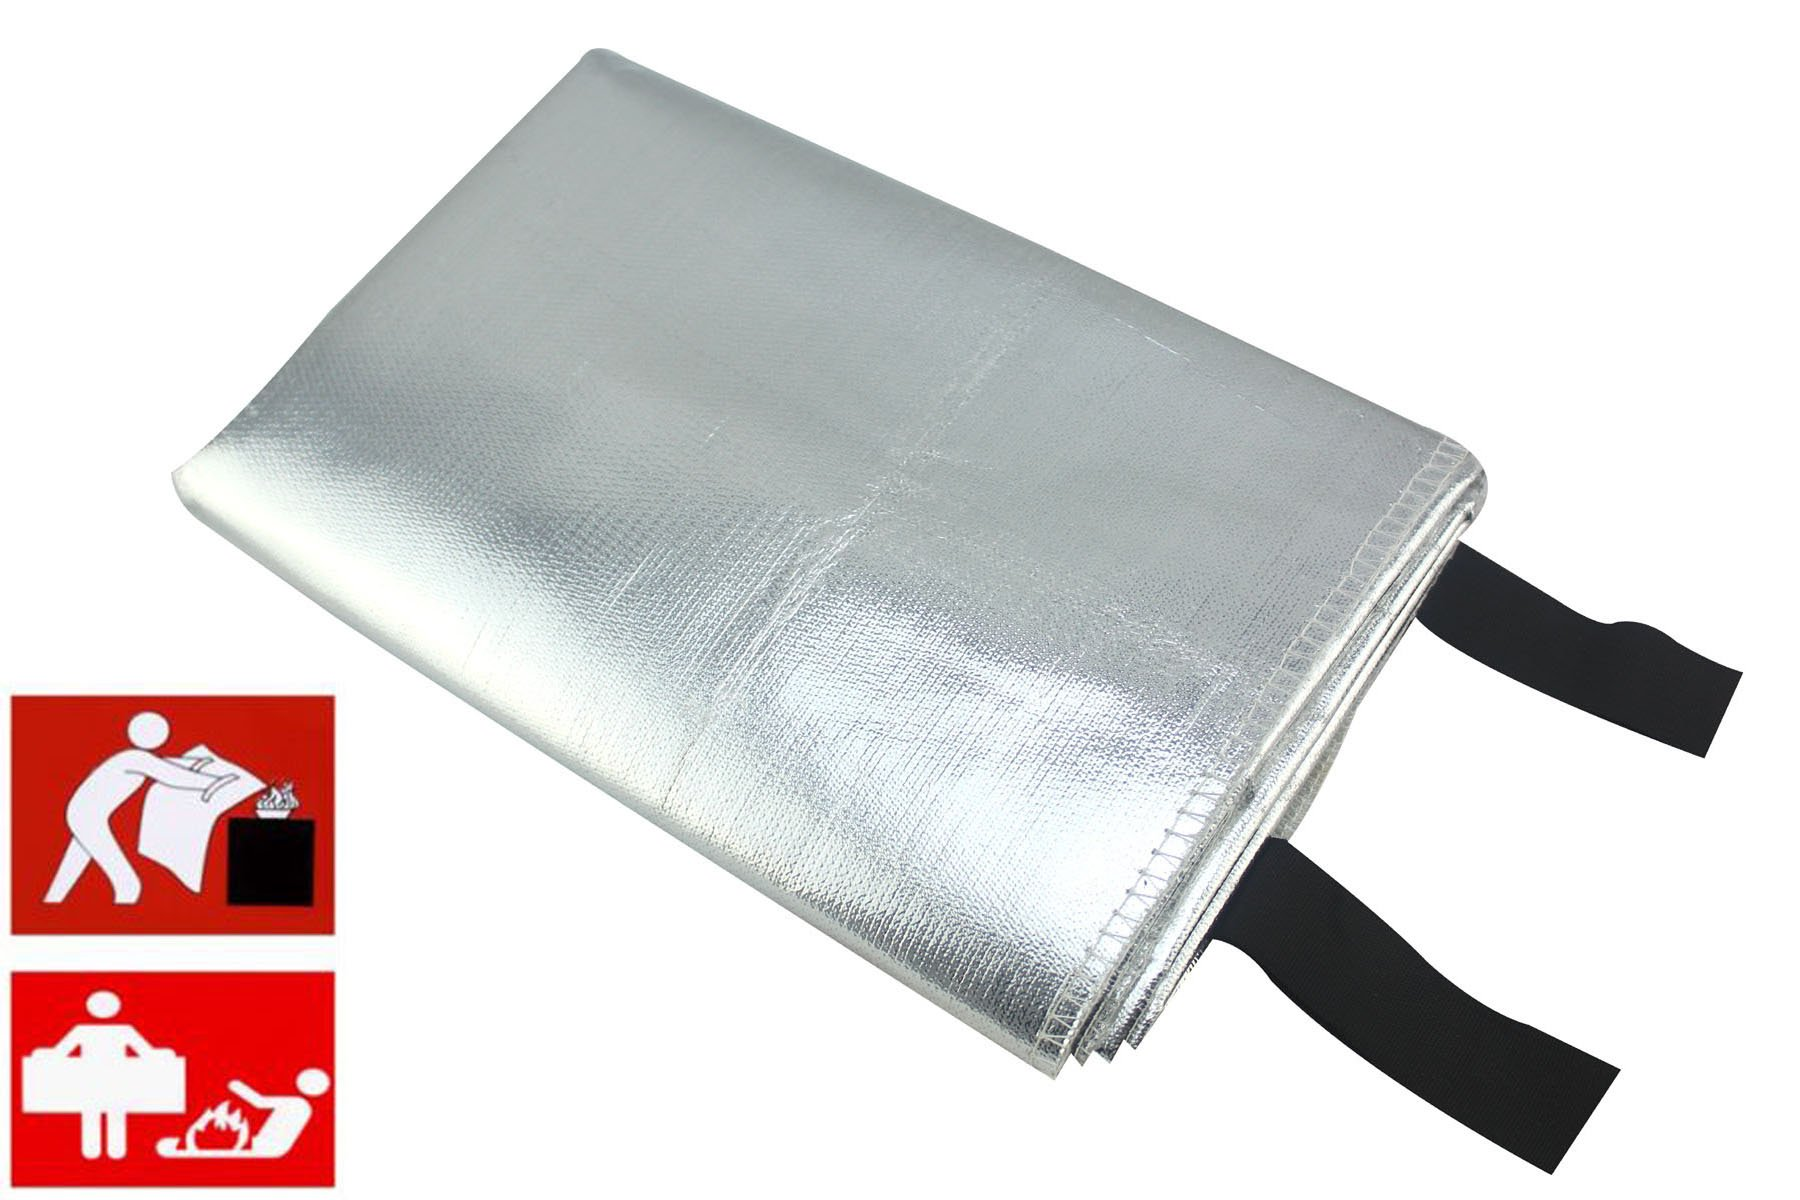 SWI parts Emergency fire blanket fibre glass with Aluminum foil heat reflect fire blanket Size:39.35''x39.35'' (Medium)